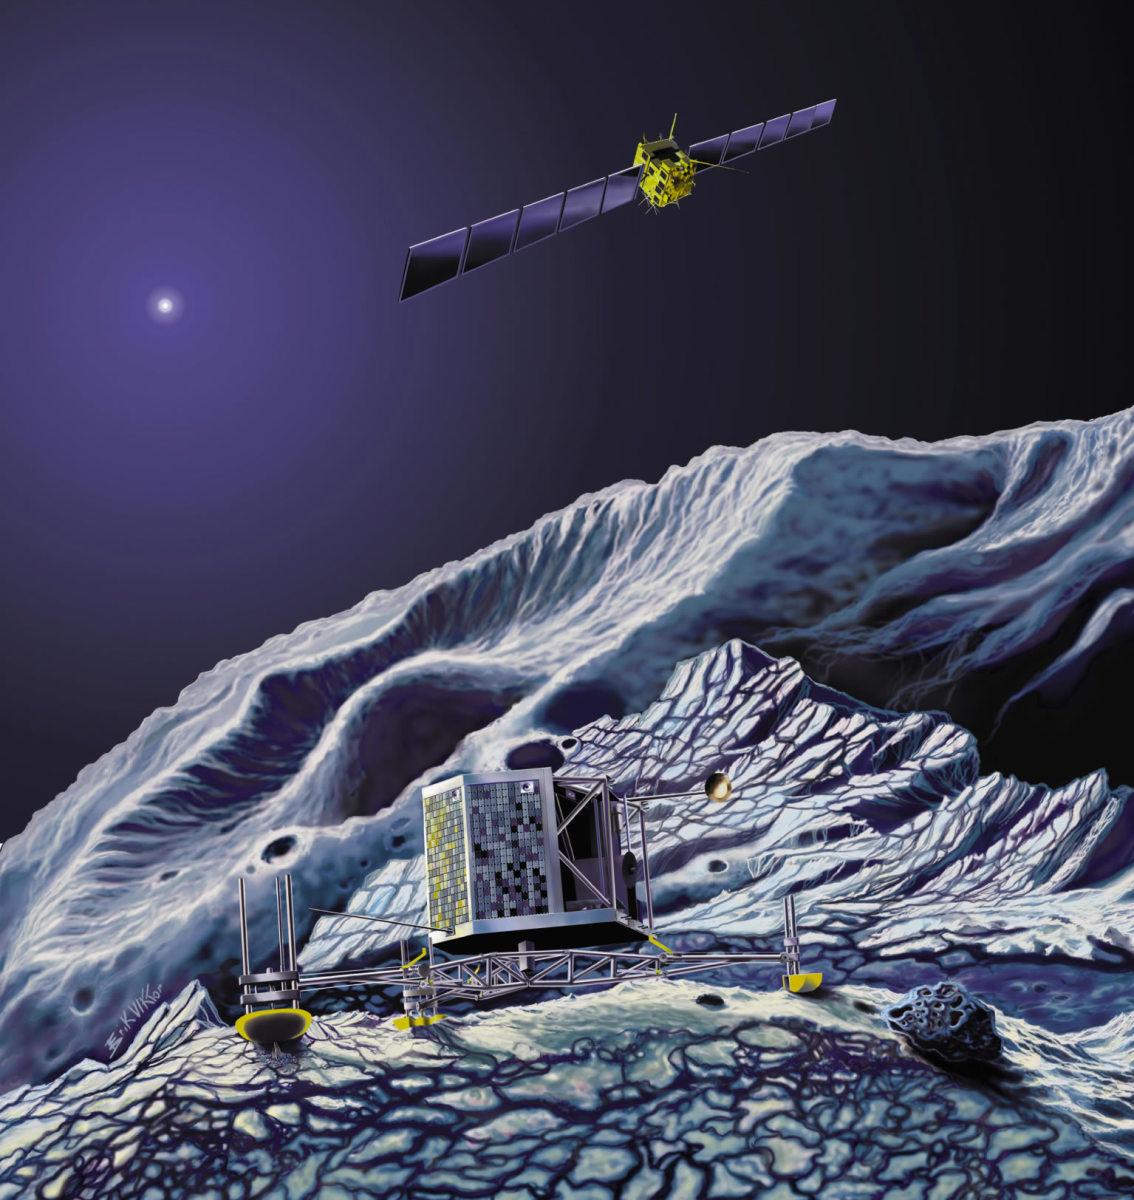 What Was The Rosetta Space Probe? The Mission to Land Philae on Comet 67P/Churyumov-Gerasimenko